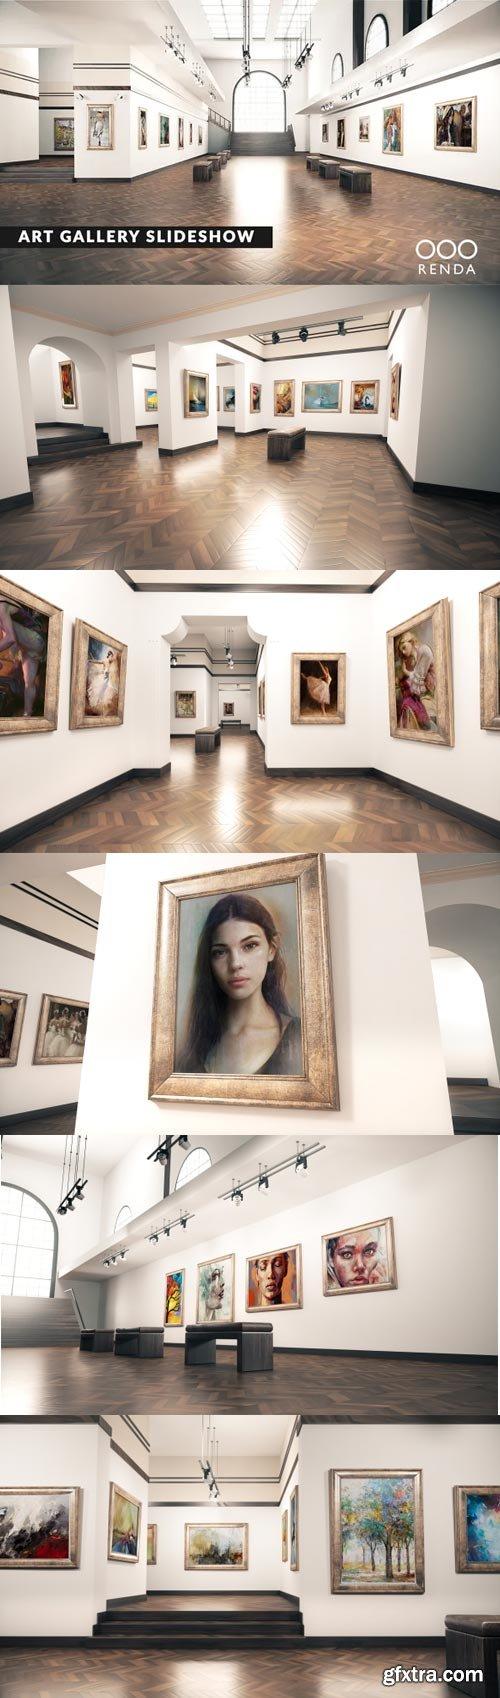 Videohive - Art Gallery Museum - 29741379